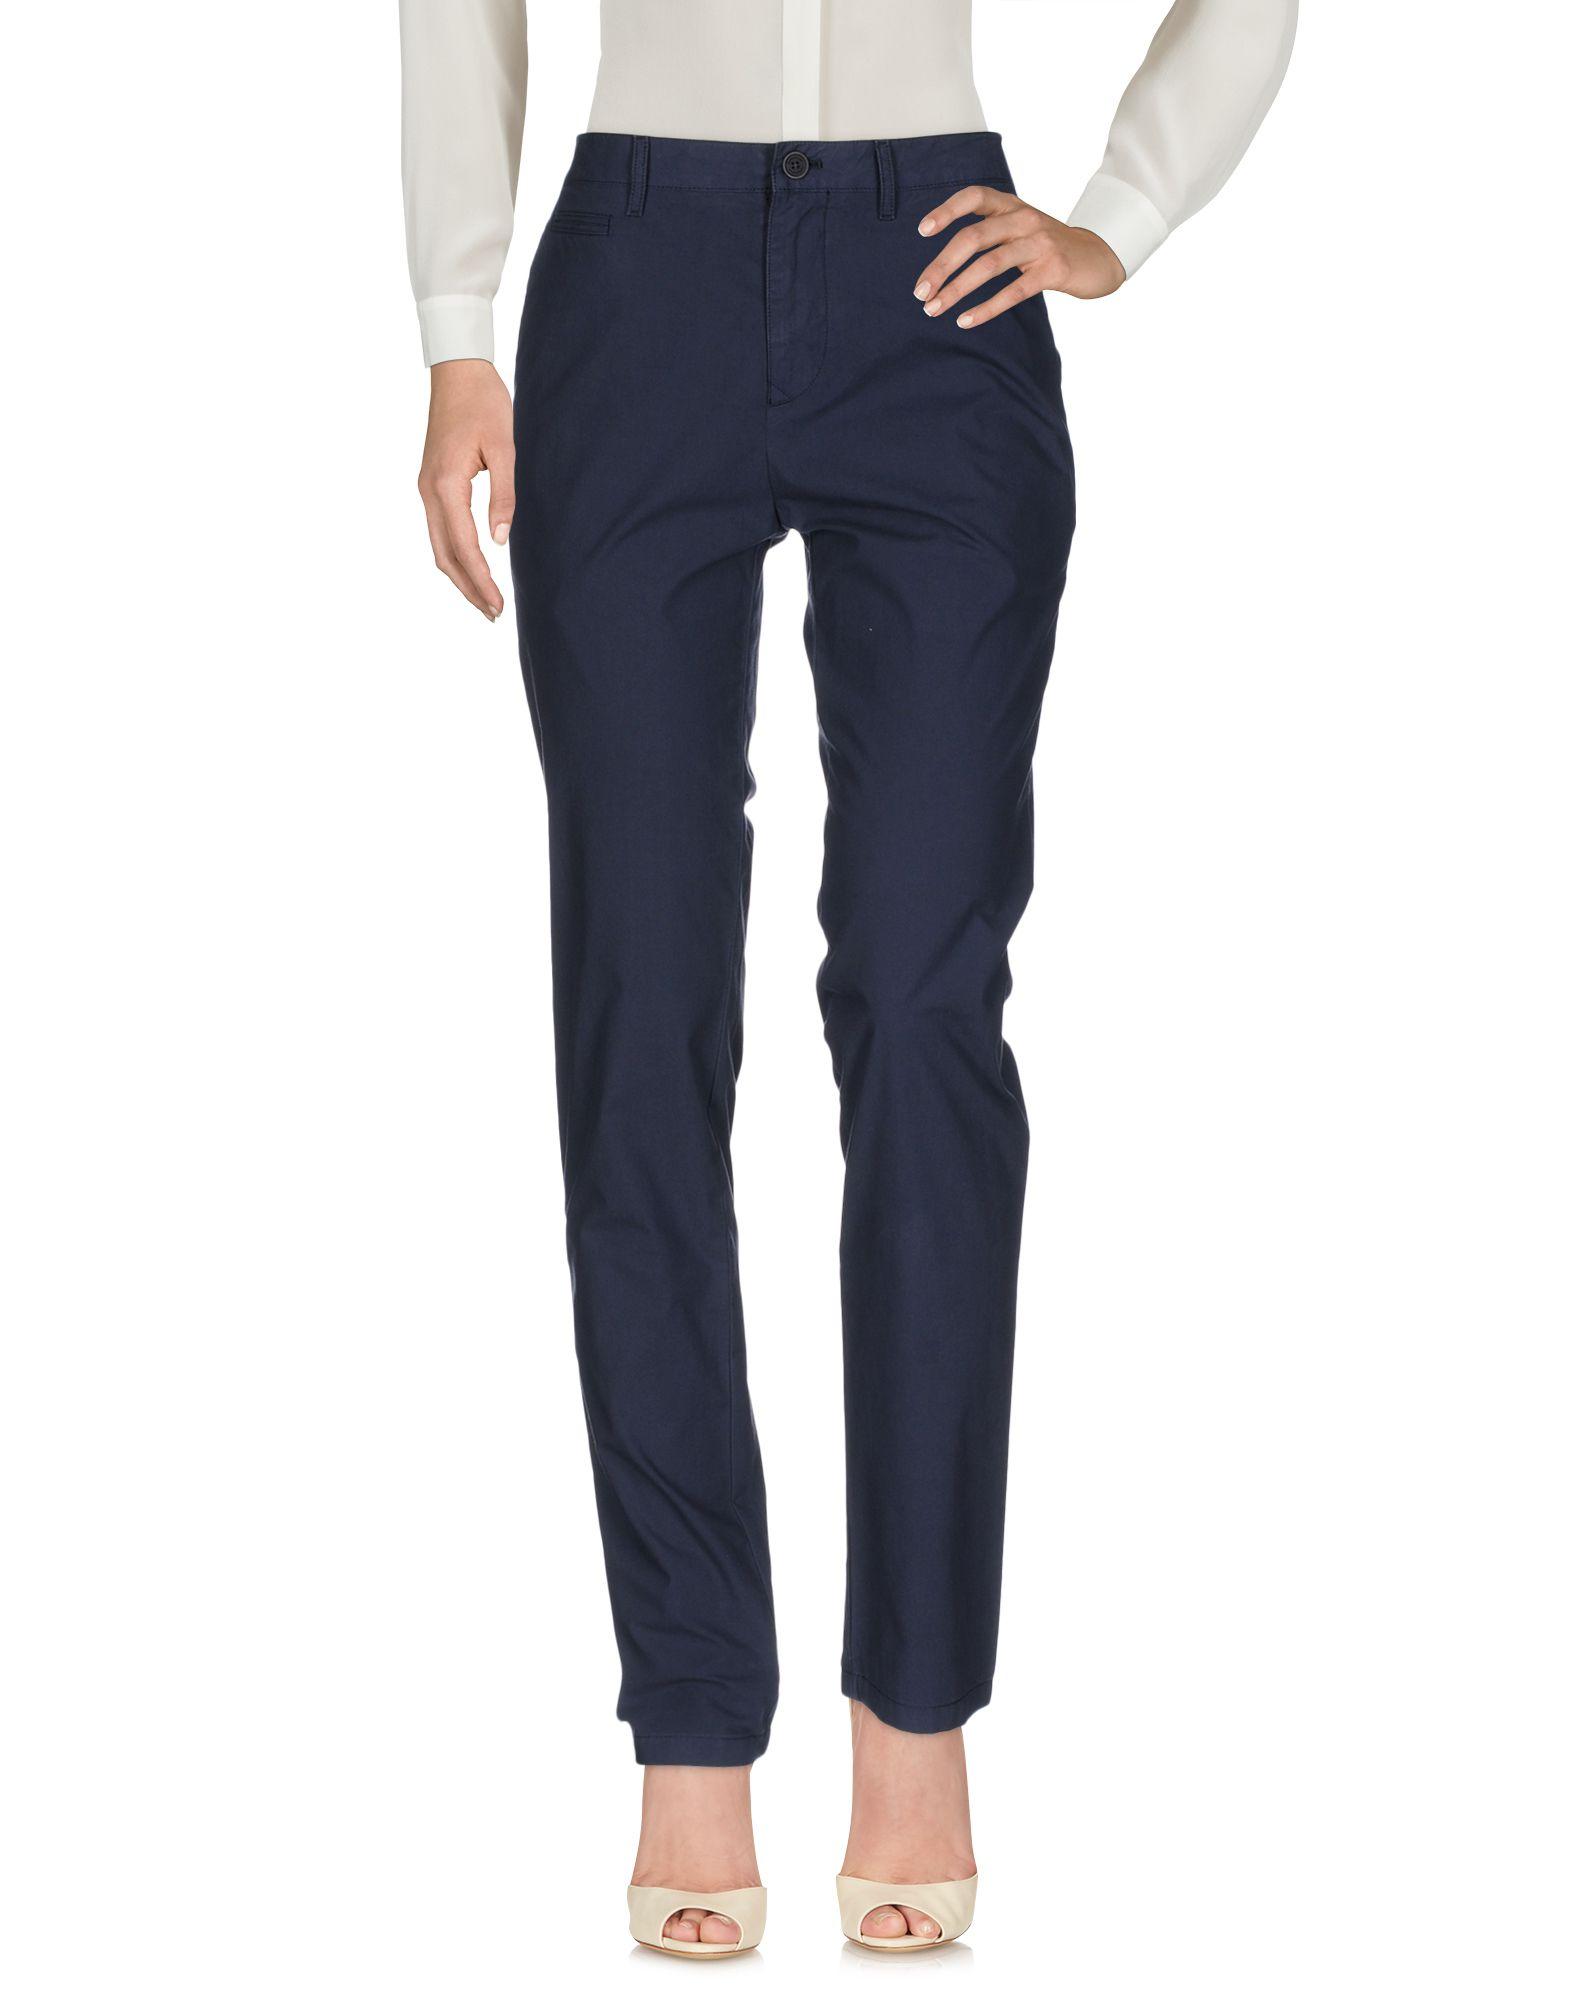 Pantalone Burberry Donna - Acquista online su Hmi7SbS